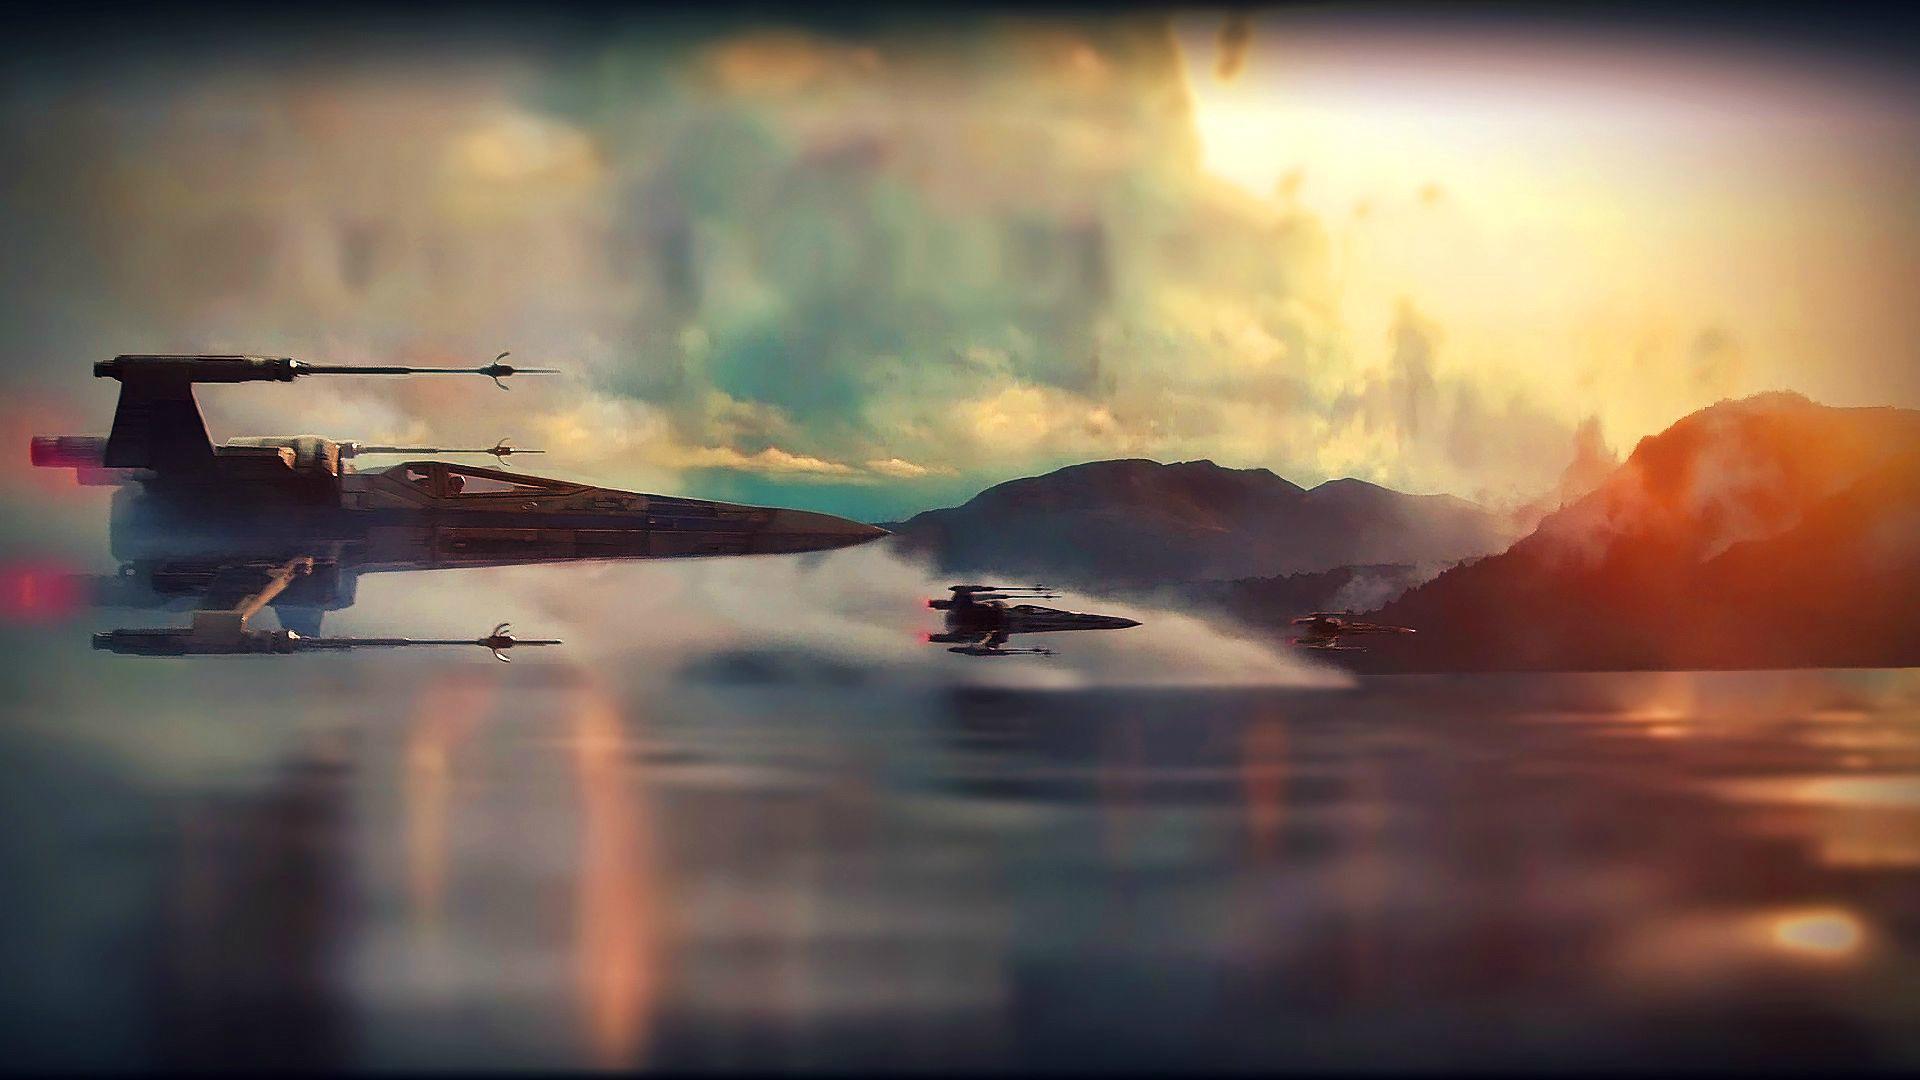 Star Wars Wallpaper Dump – 1080p